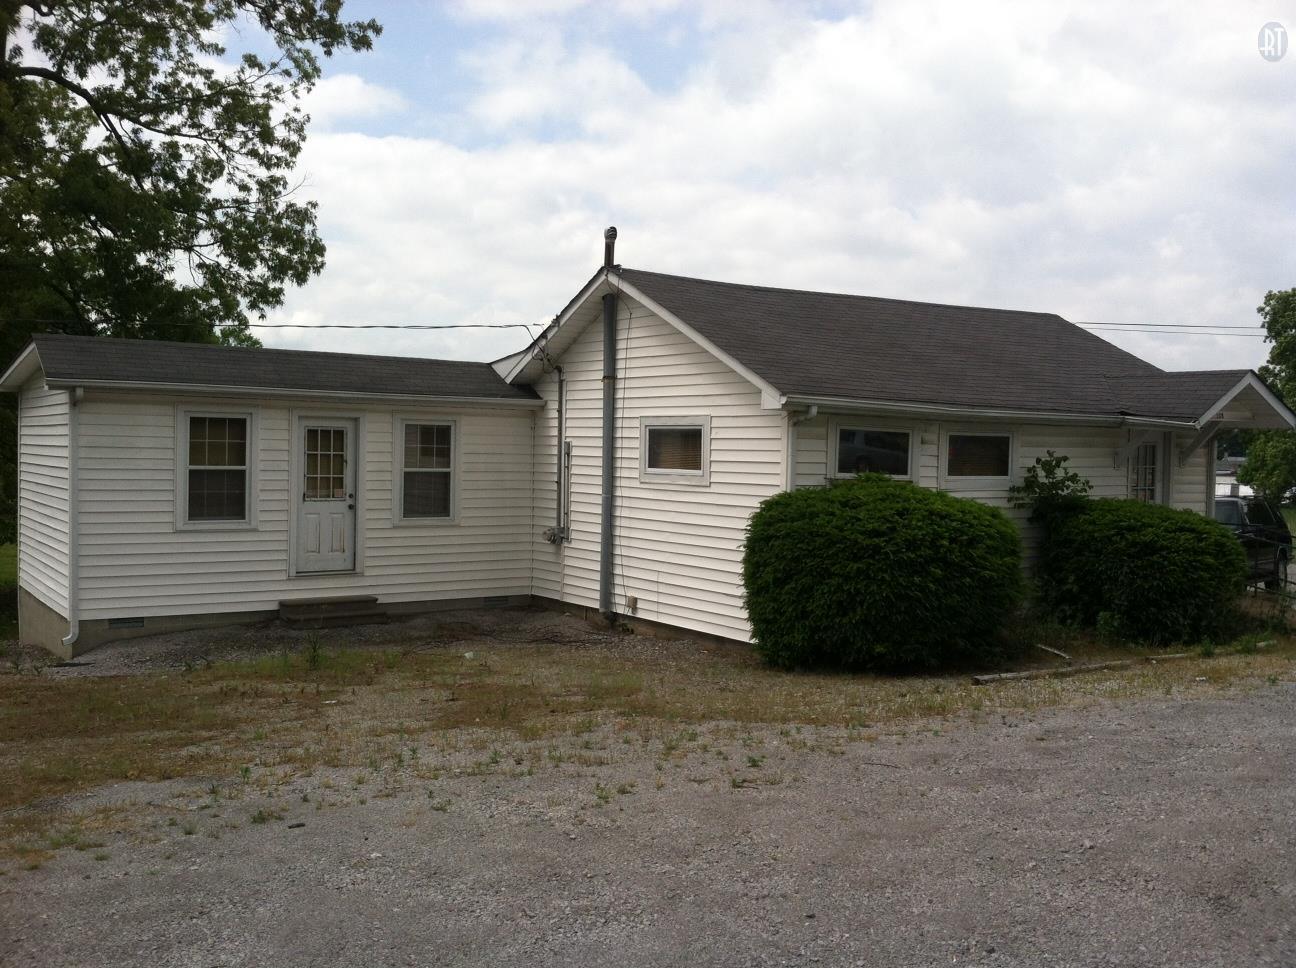 108 Bryan Ave, Dickson, TN 37055